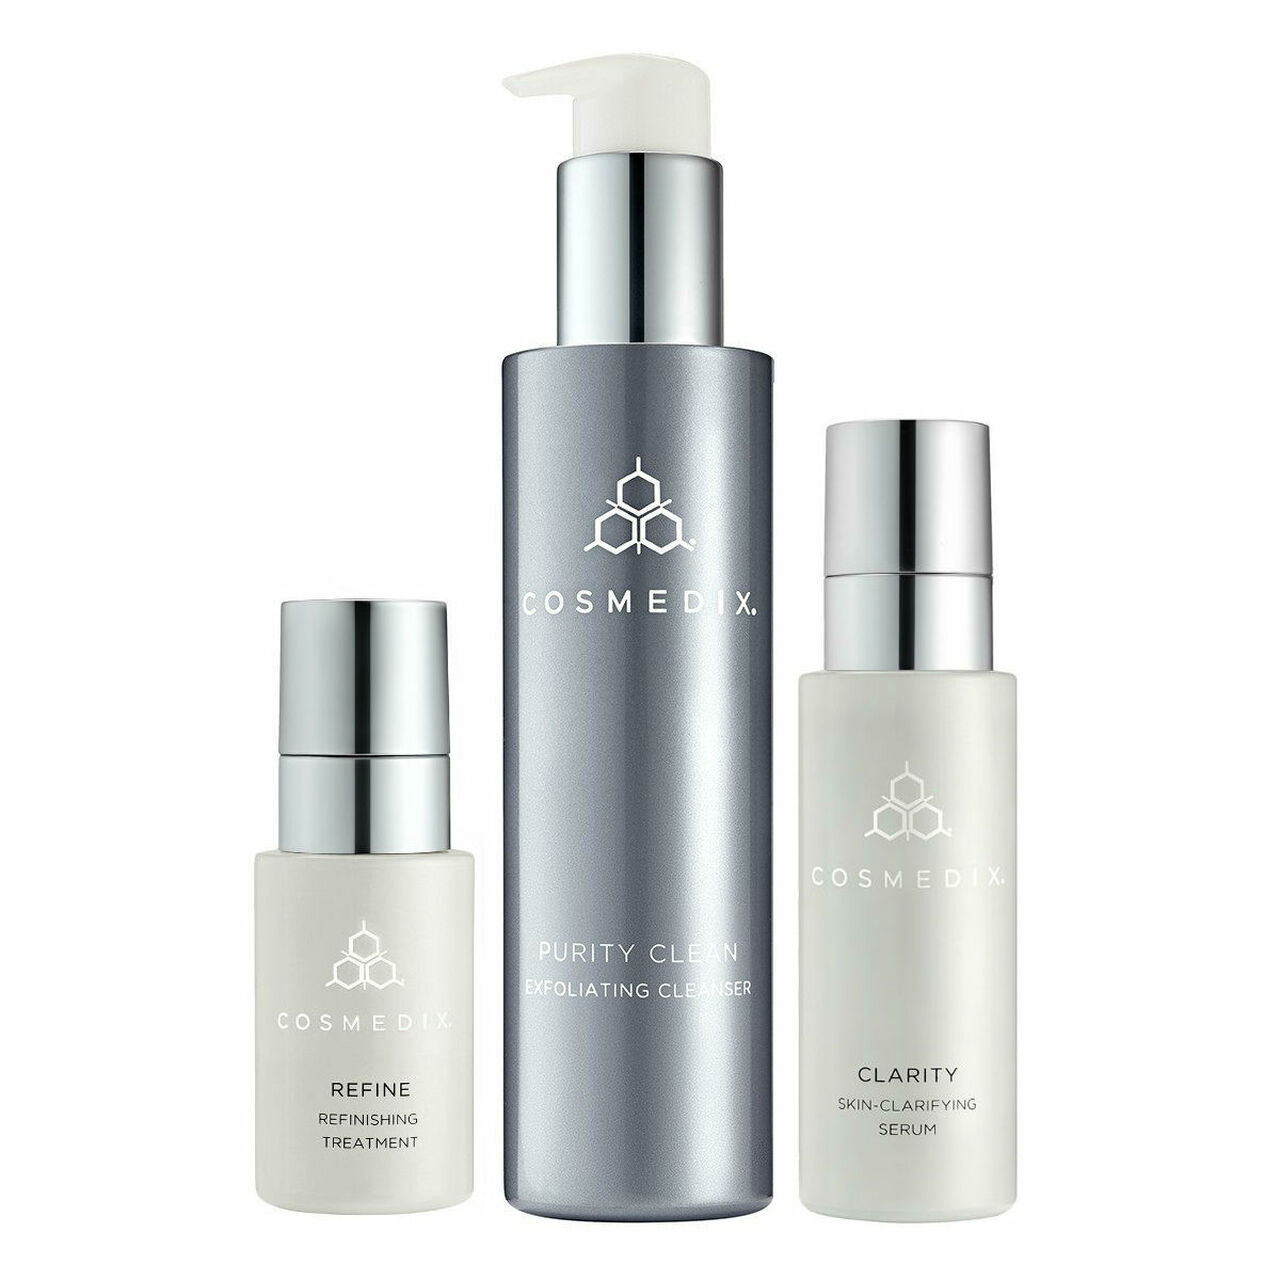 2 Pack - CosMedix Clarity Skin-Clarifying Serum 1 oz Karite Lips Shea Butter Lip Balm With Vanilla By Mode De Vie - 0.15 Oz, 6 Pack